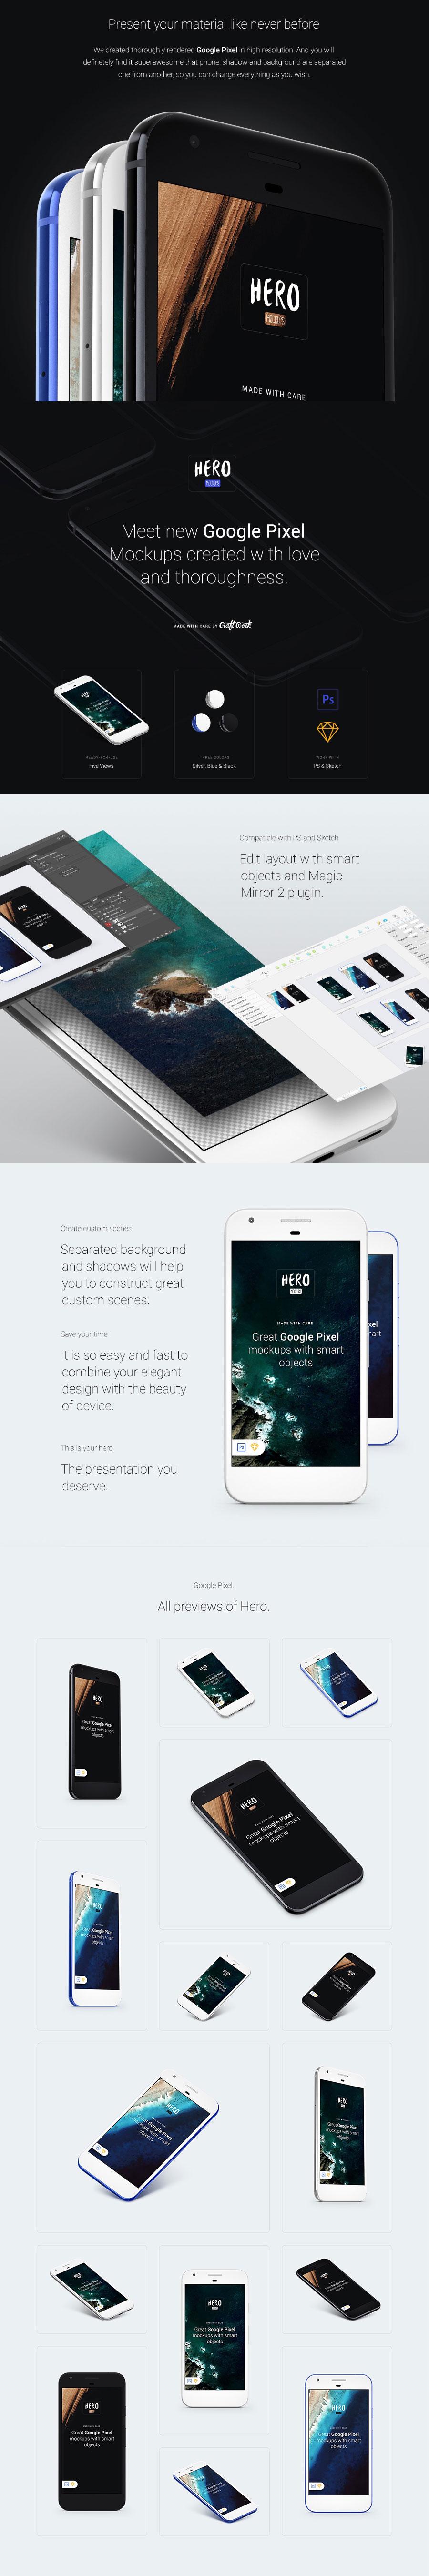 Google Pixel完美的安卓UI设计展示模型Mockup免费下载[PSD]